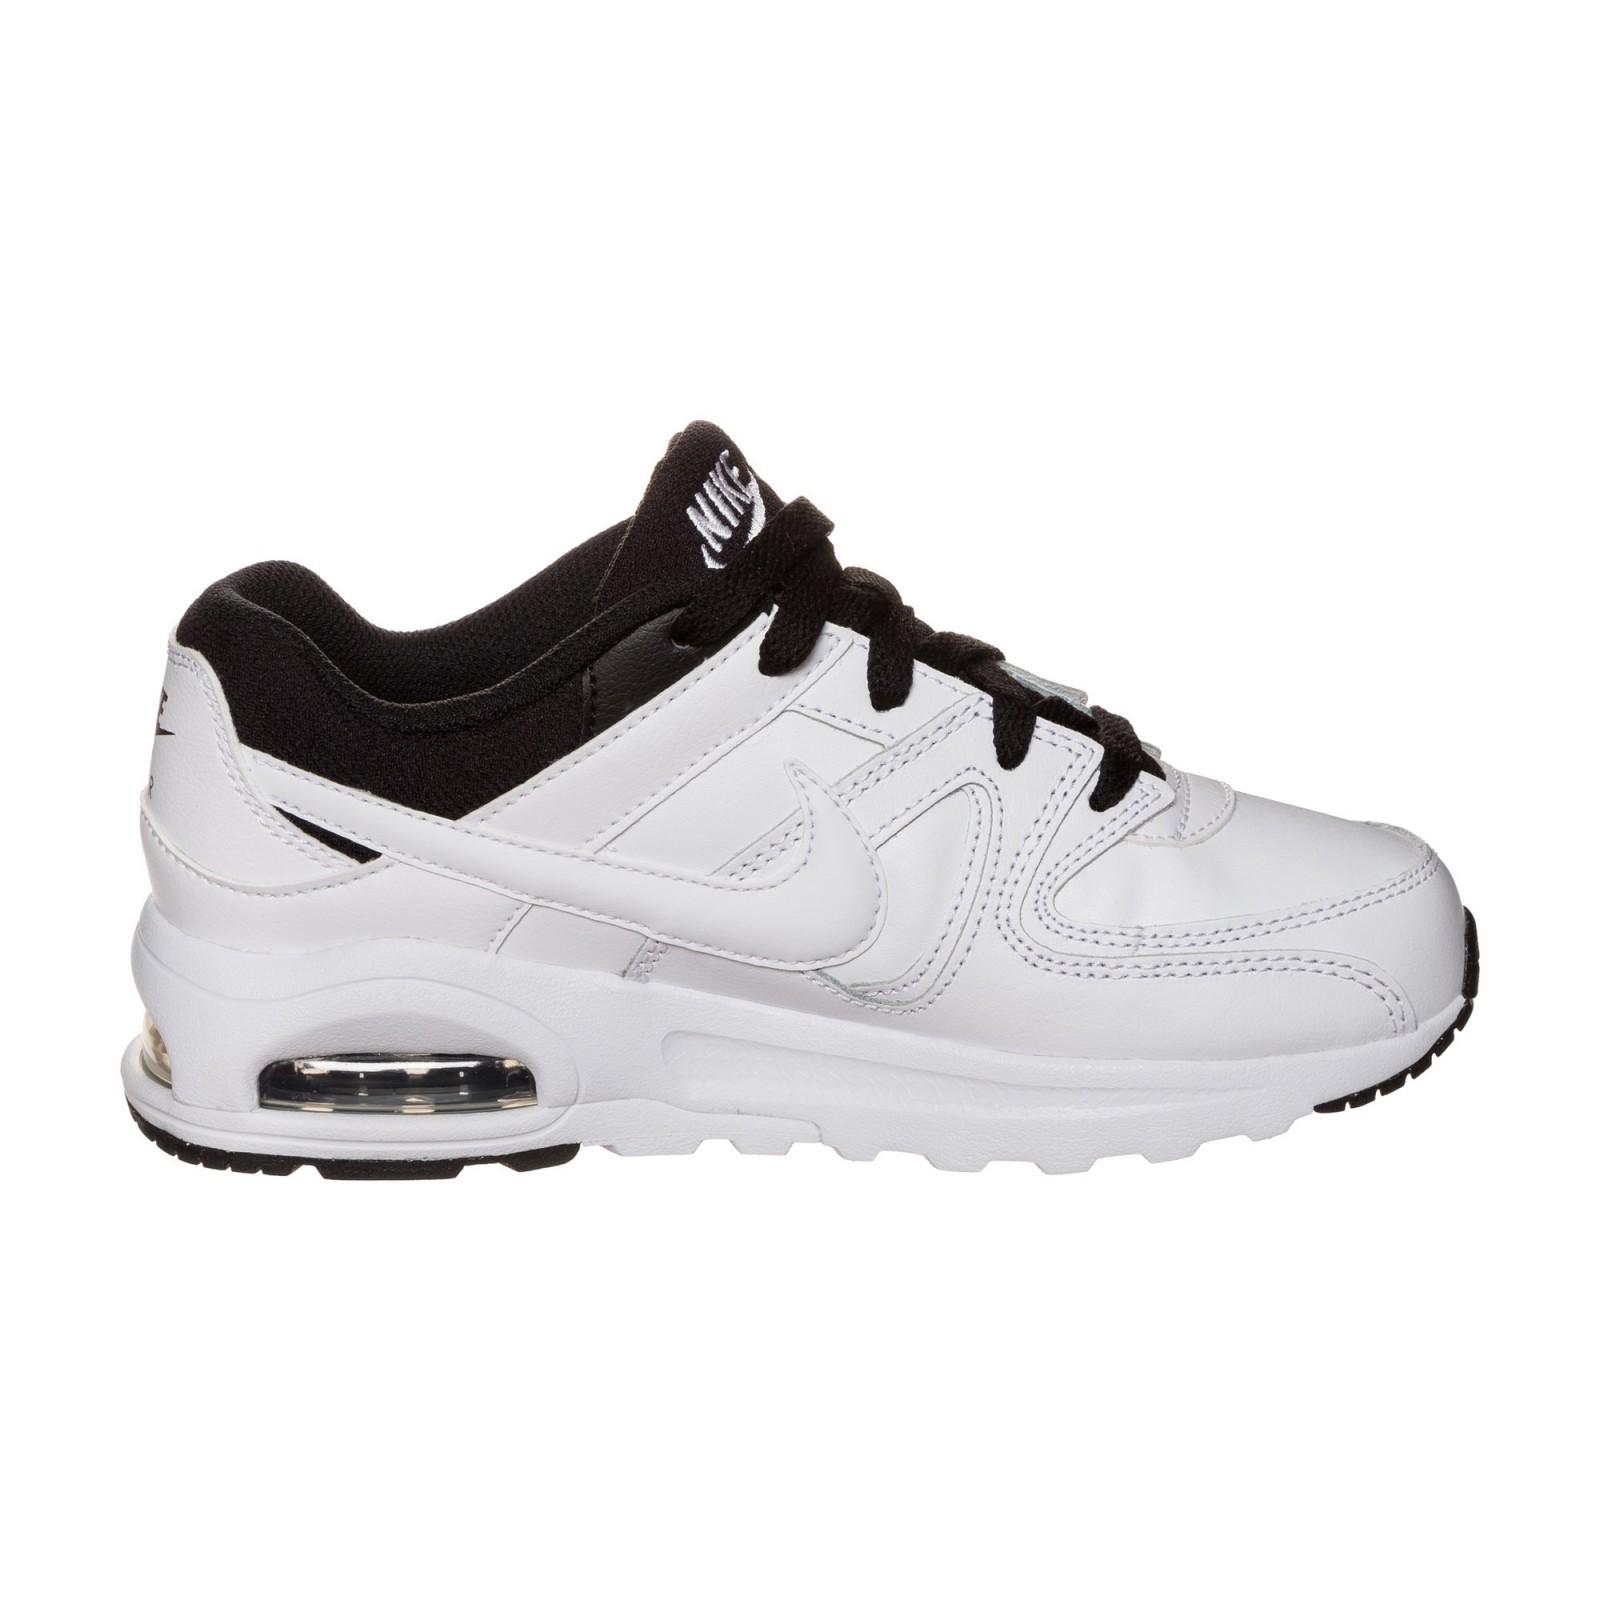 online store 65ba1 198cc Dětské boty Nike AIR MAX COMMAND FLEX LTR PS